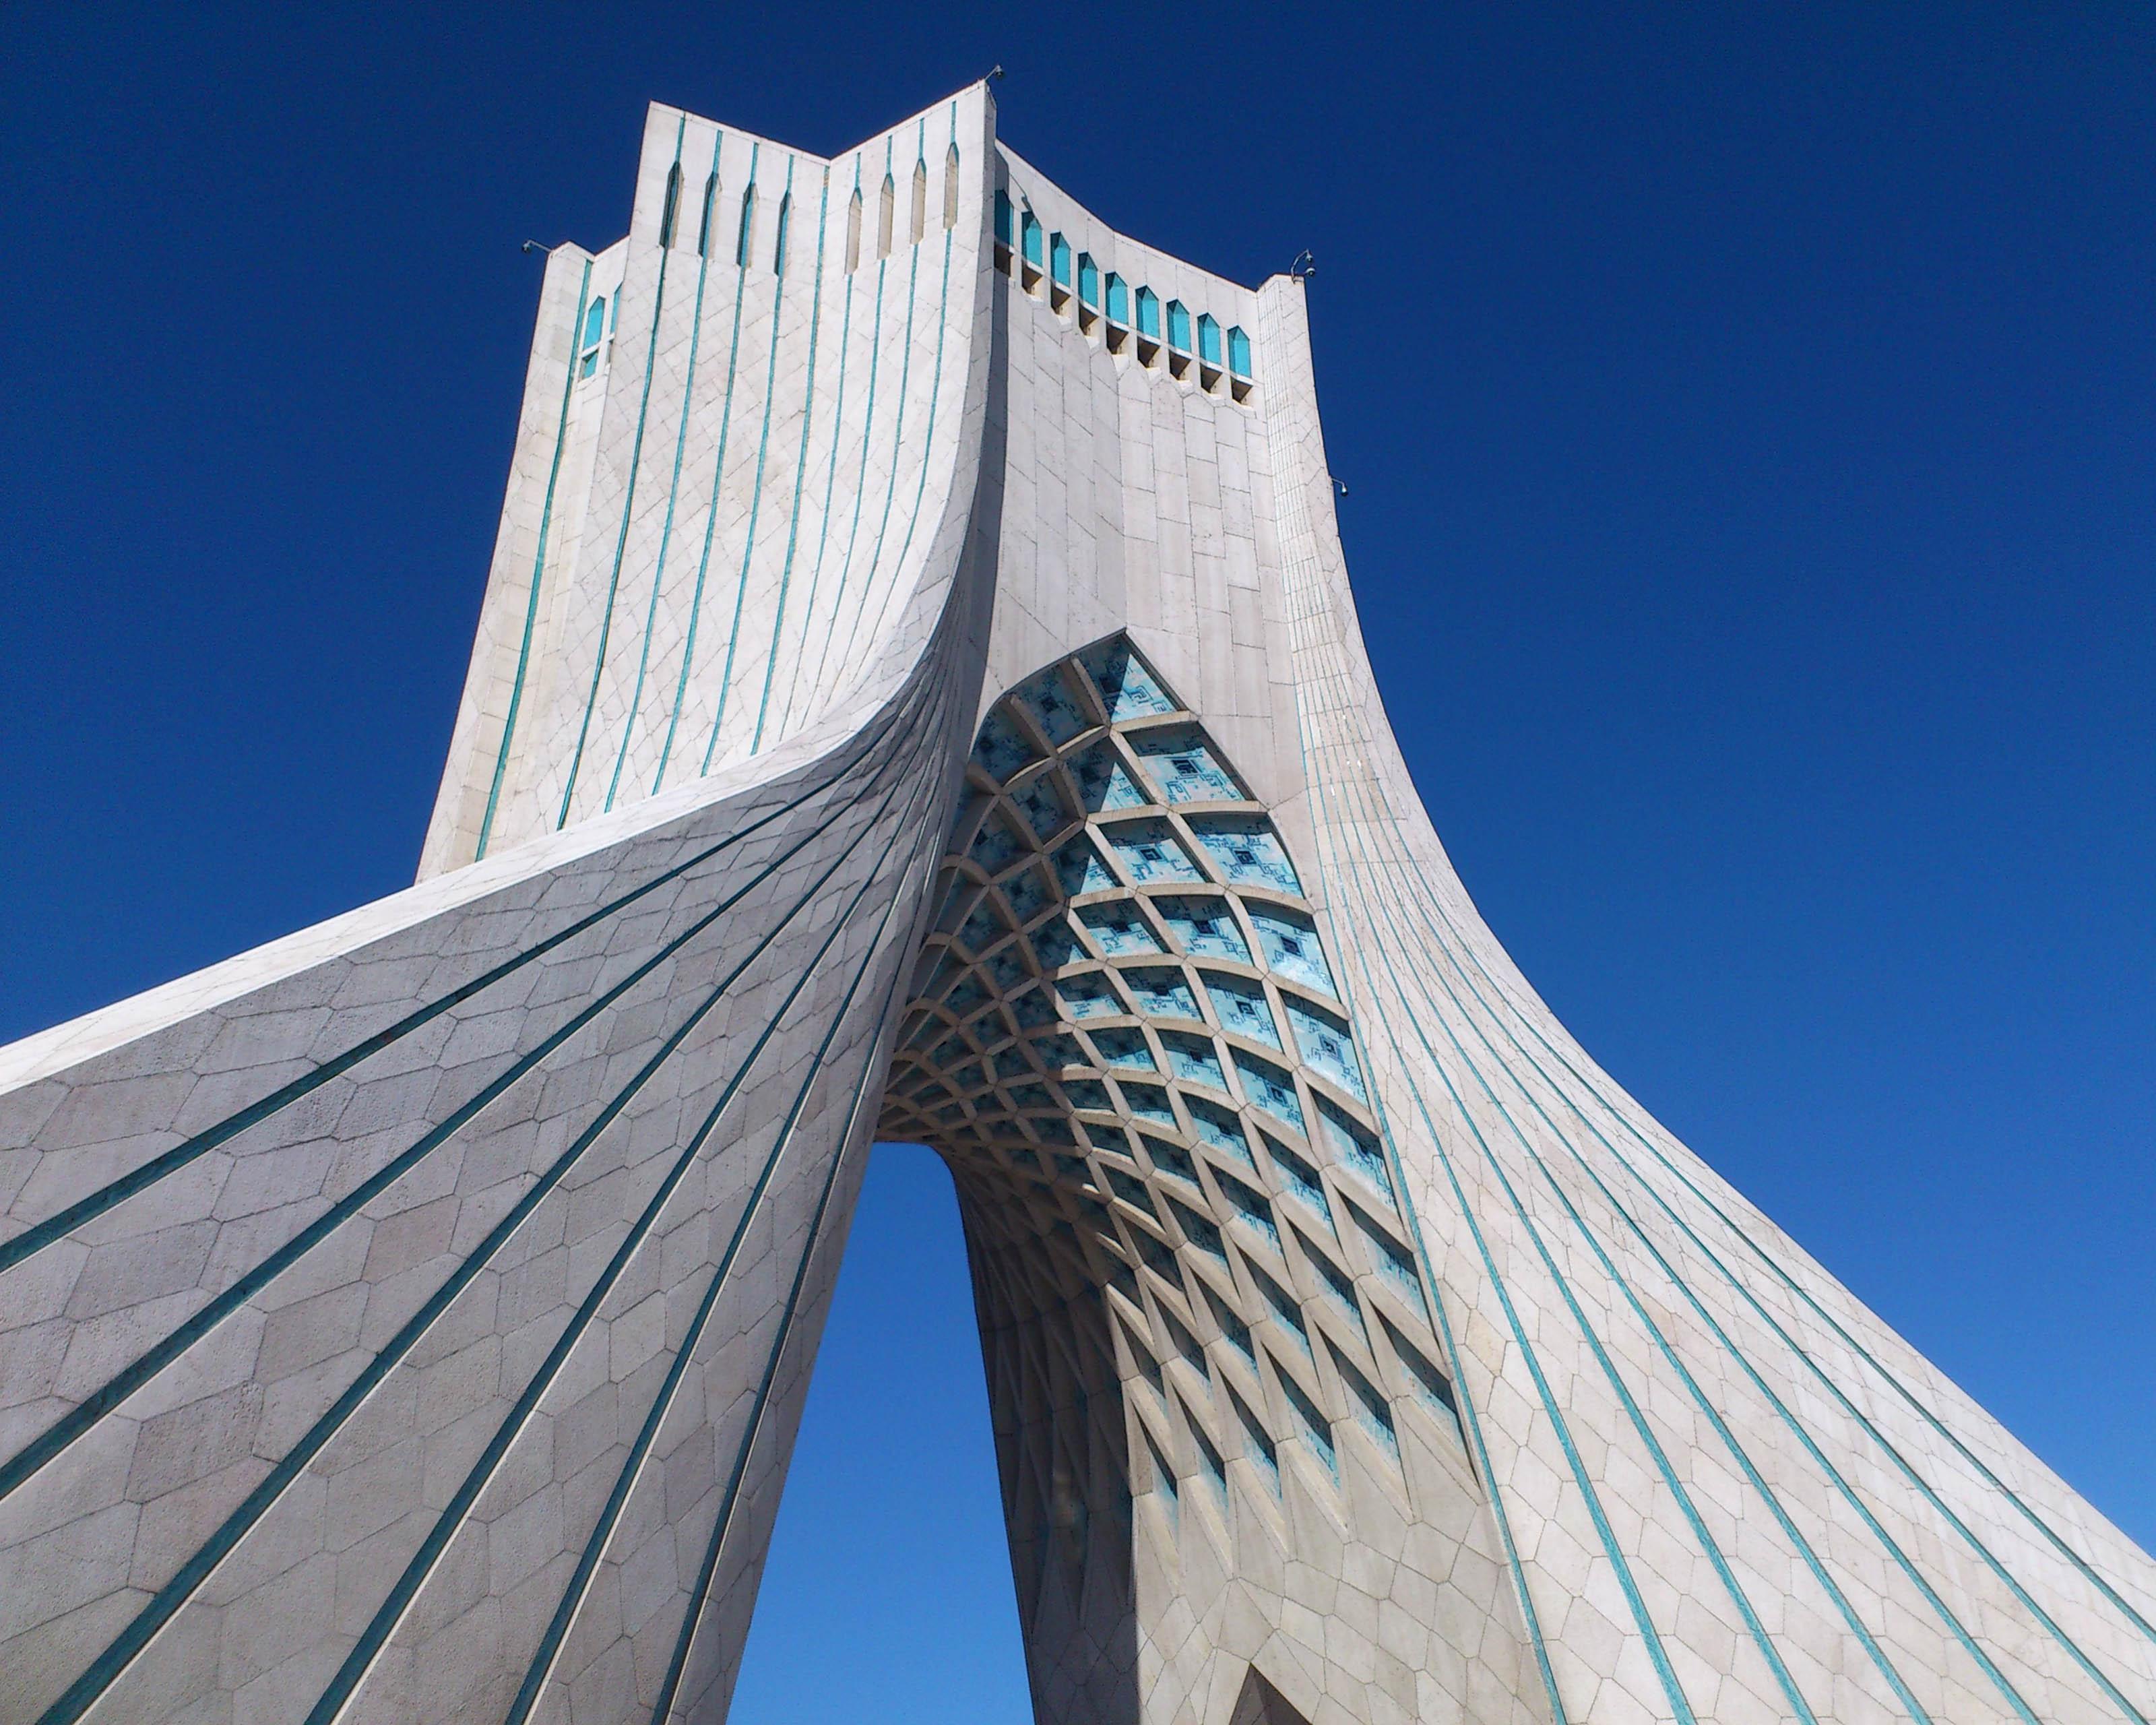 Iranian Sebt Tour Operator - Awesome Building